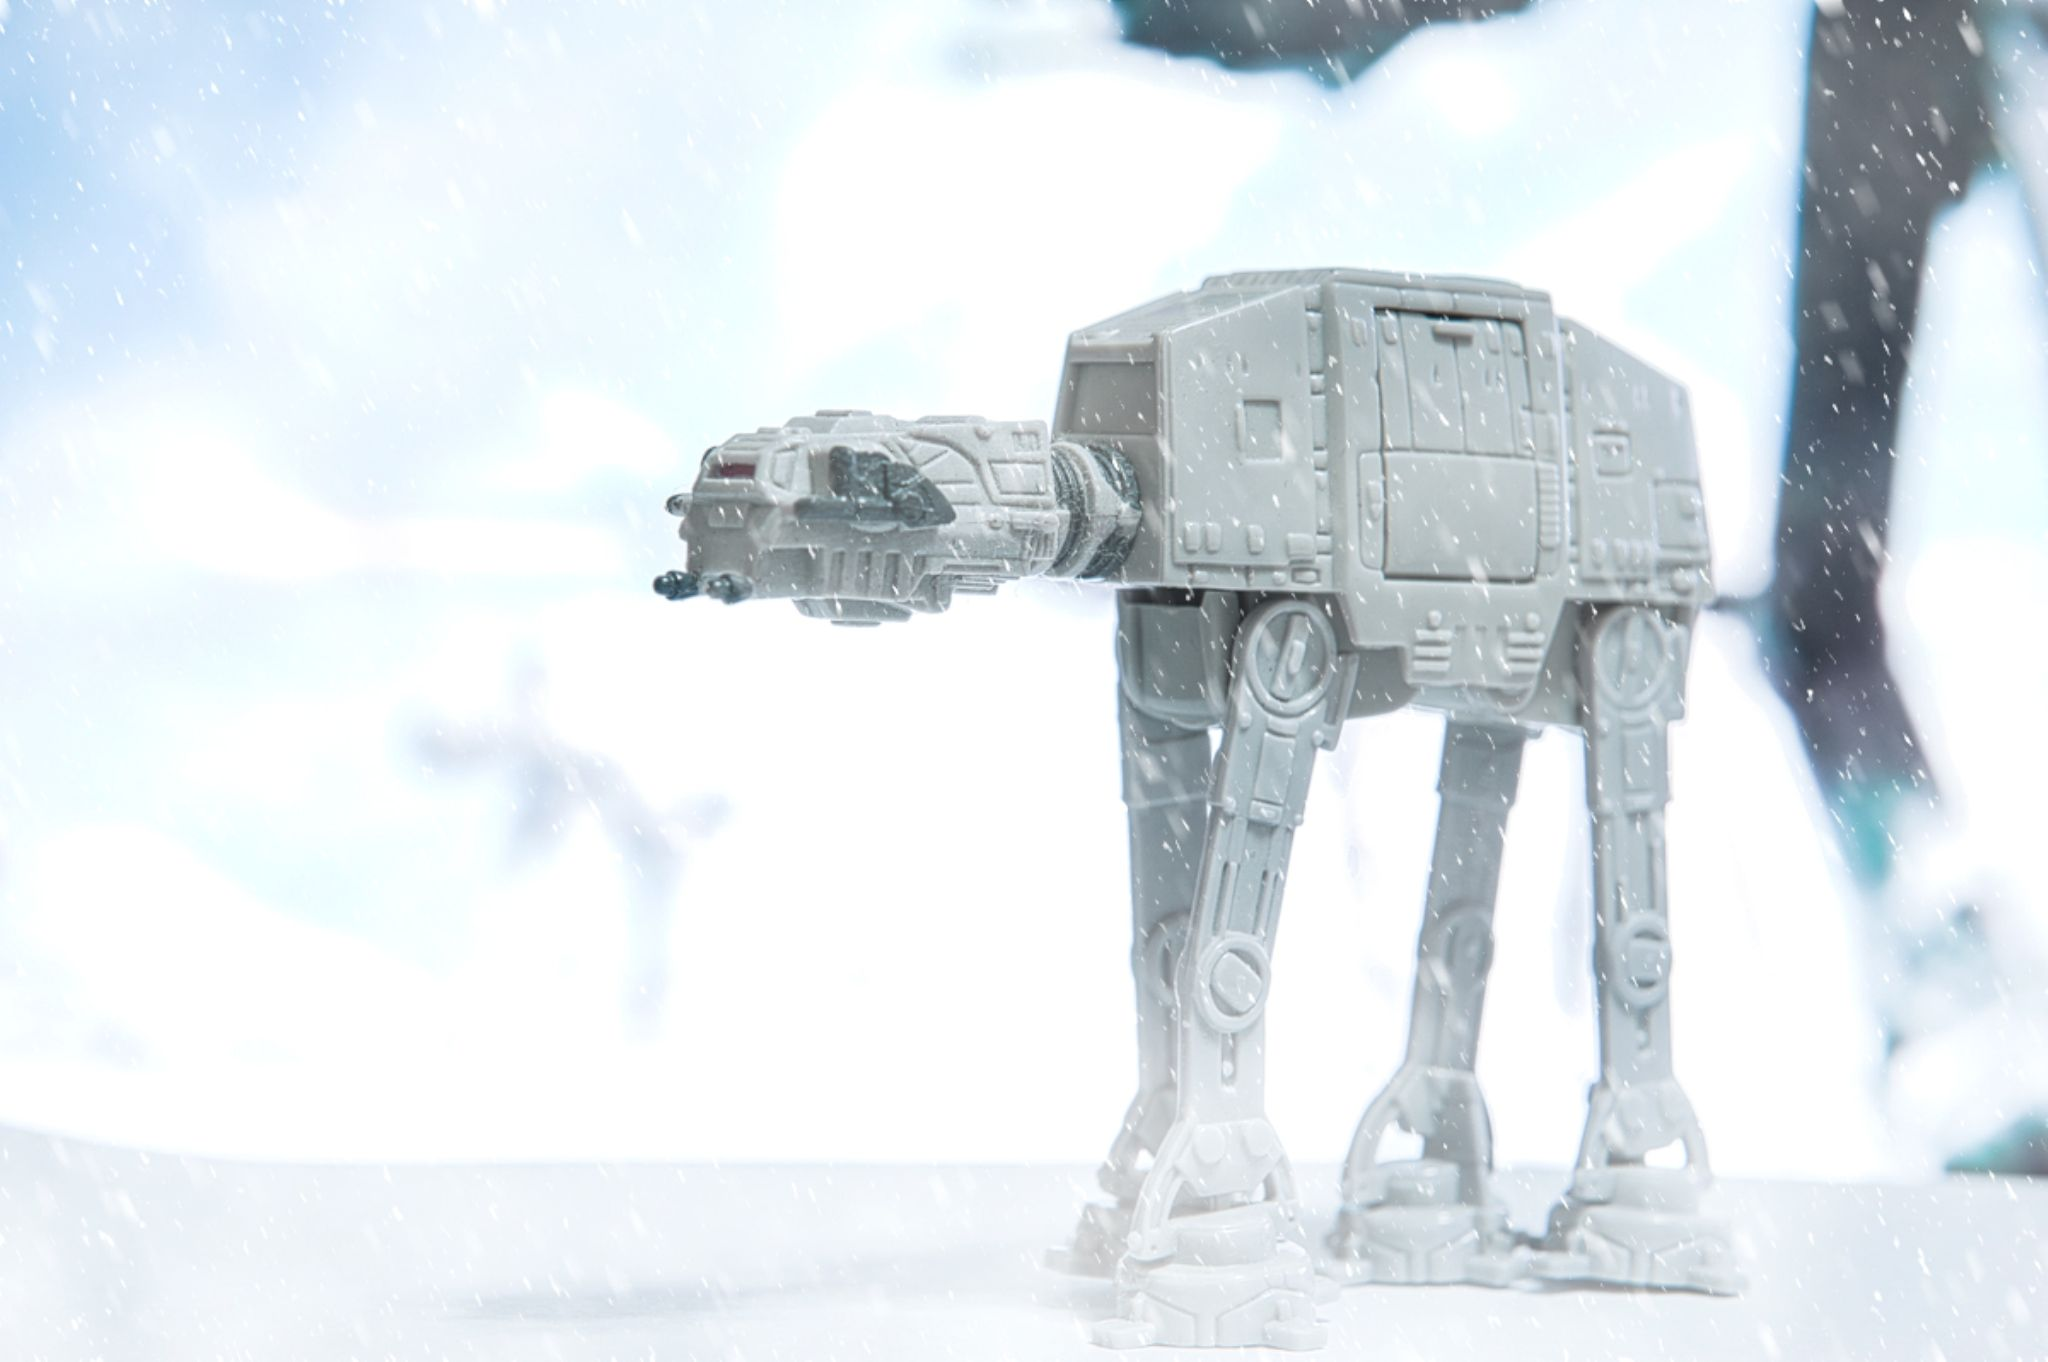 Through The Blizzard by Robbie Hilado